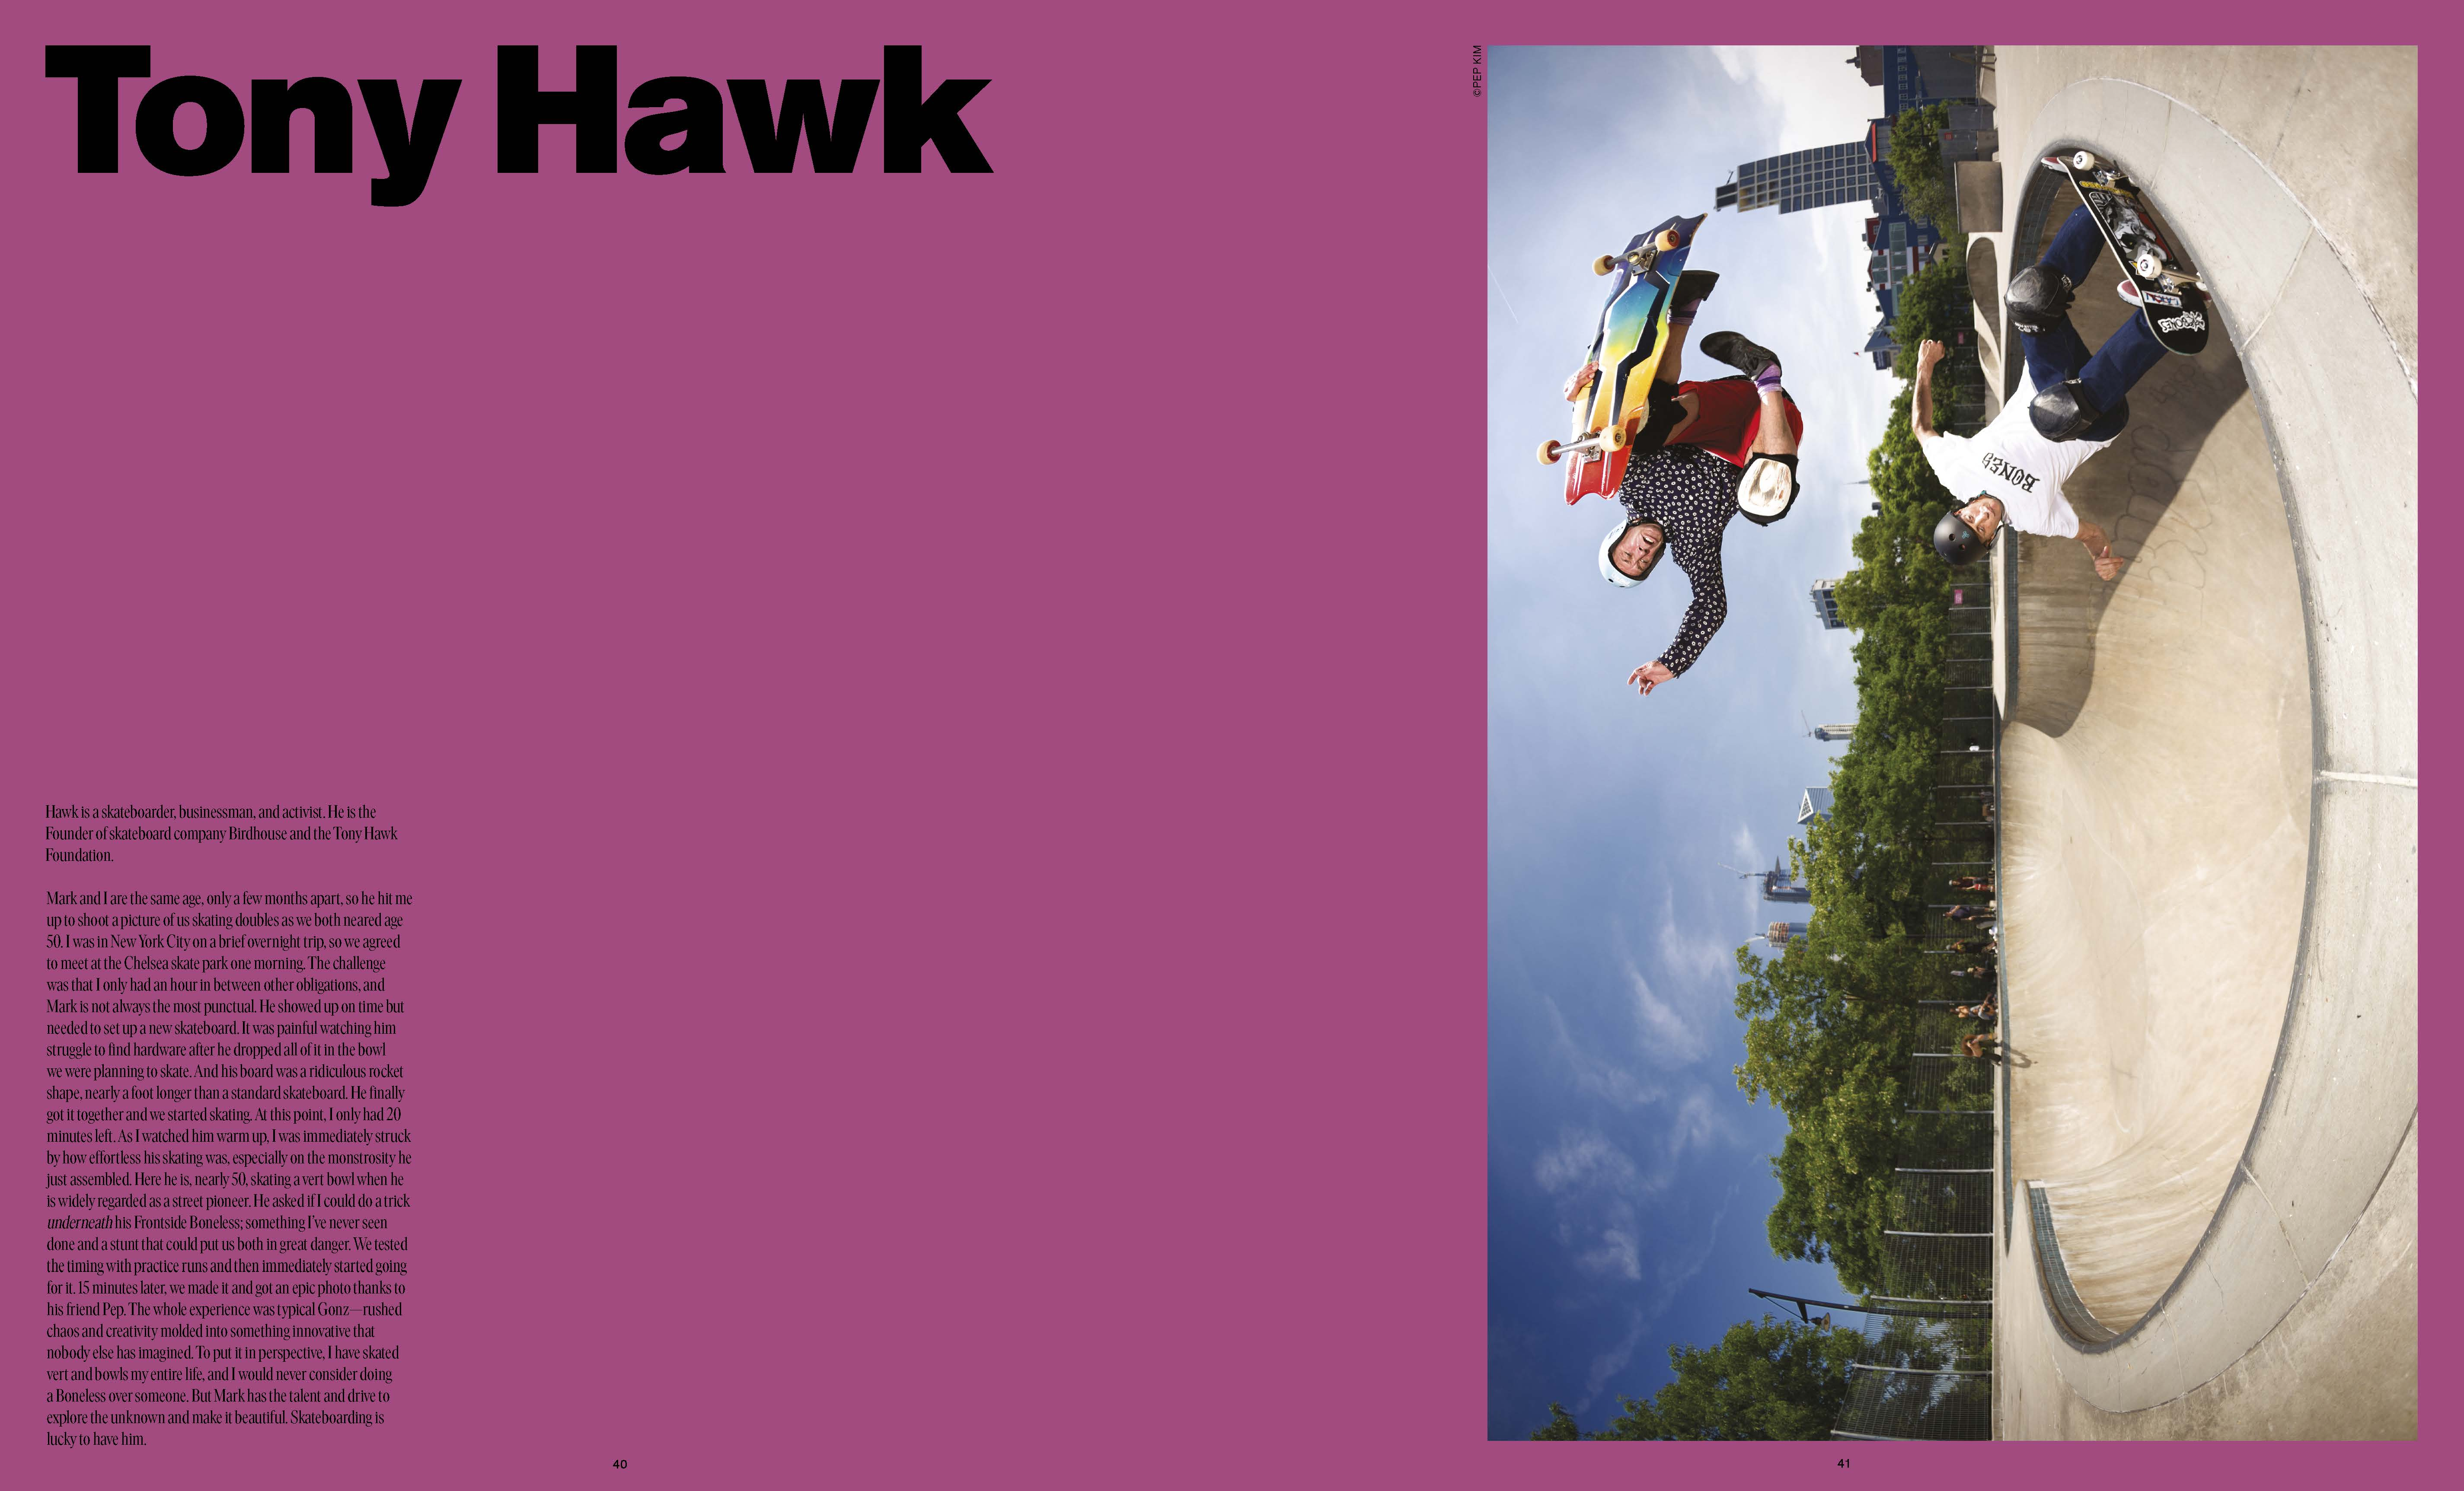 Tony Hawk and Mark Gonzales.Tony Hawk and Mark Gonzales.